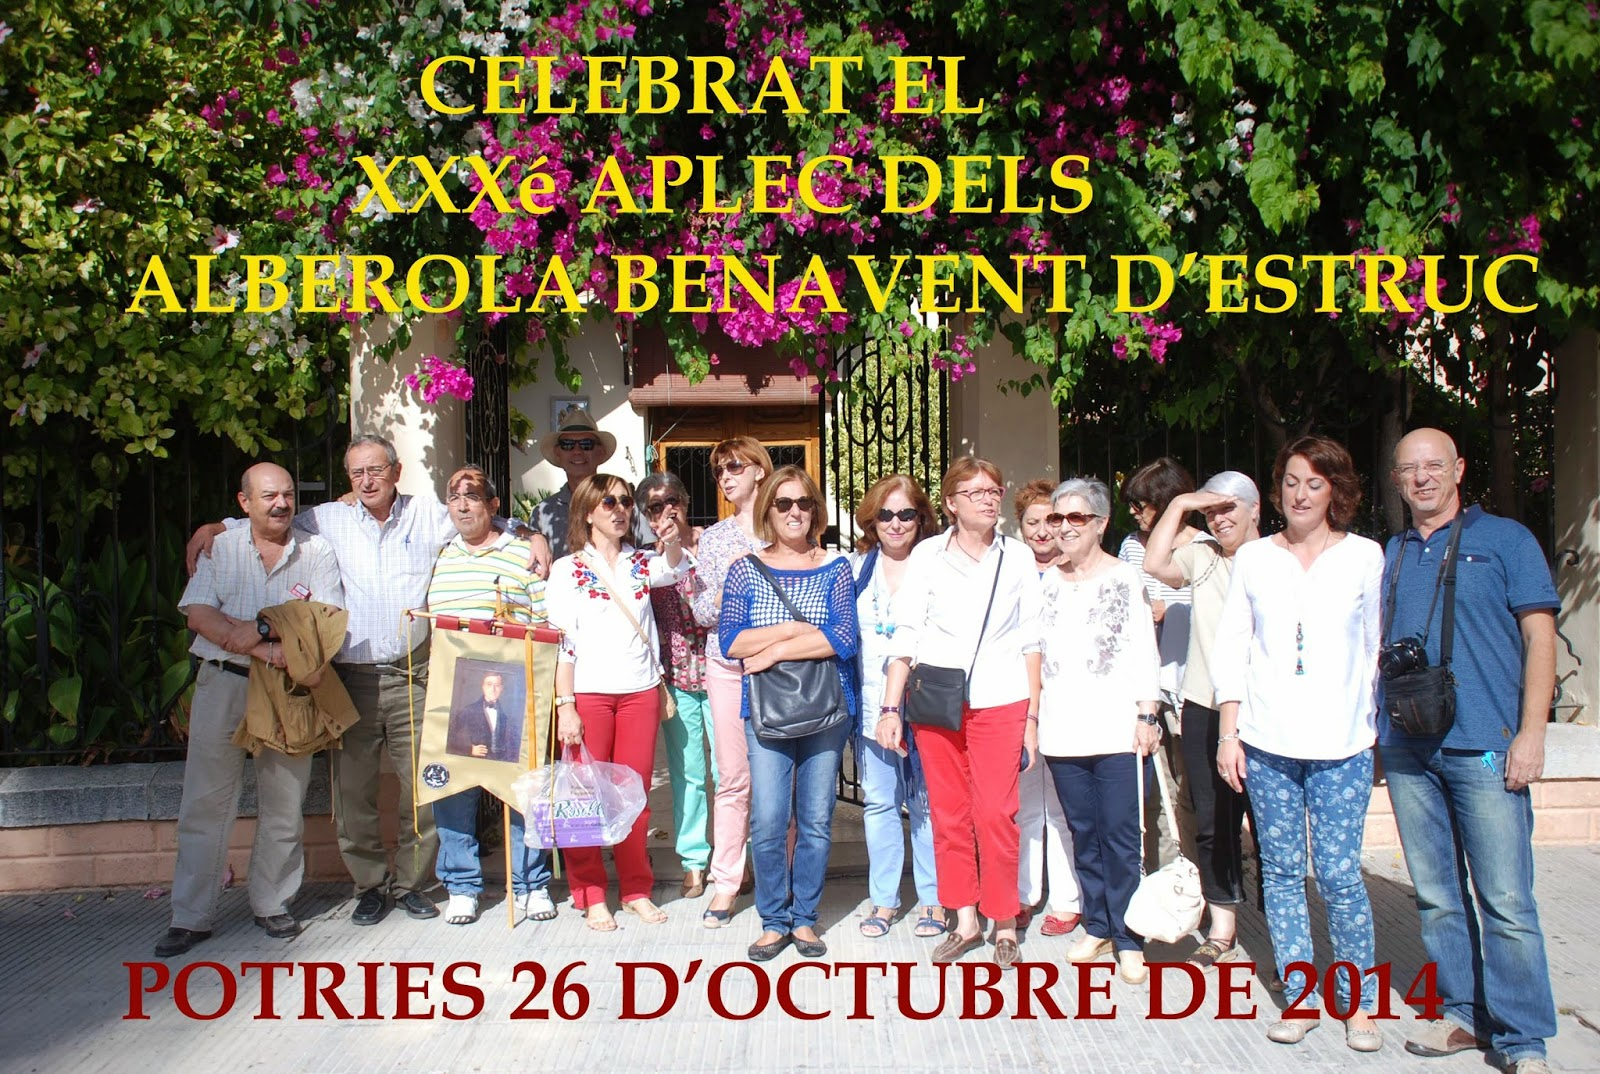 http://lordedelalmassera.blogspot.com.es/p/activitats.html